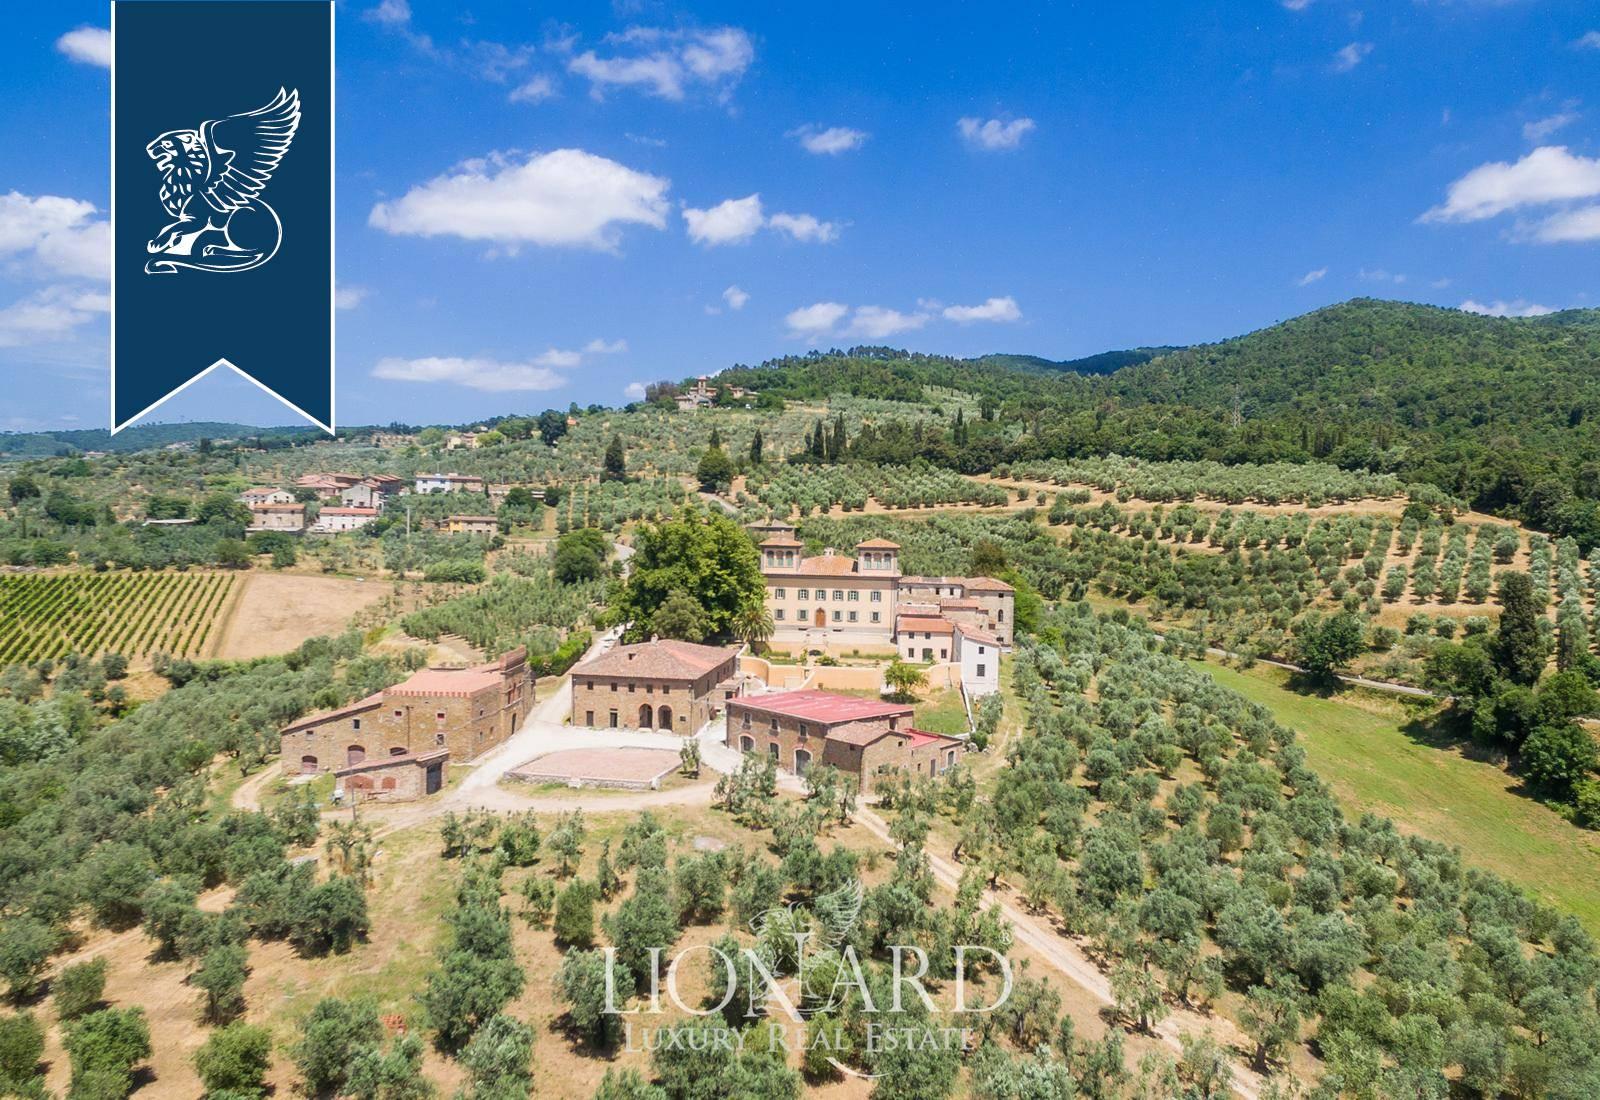 Villa in Vendita a Vinci: 0 locali, 5246 mq - Foto 4